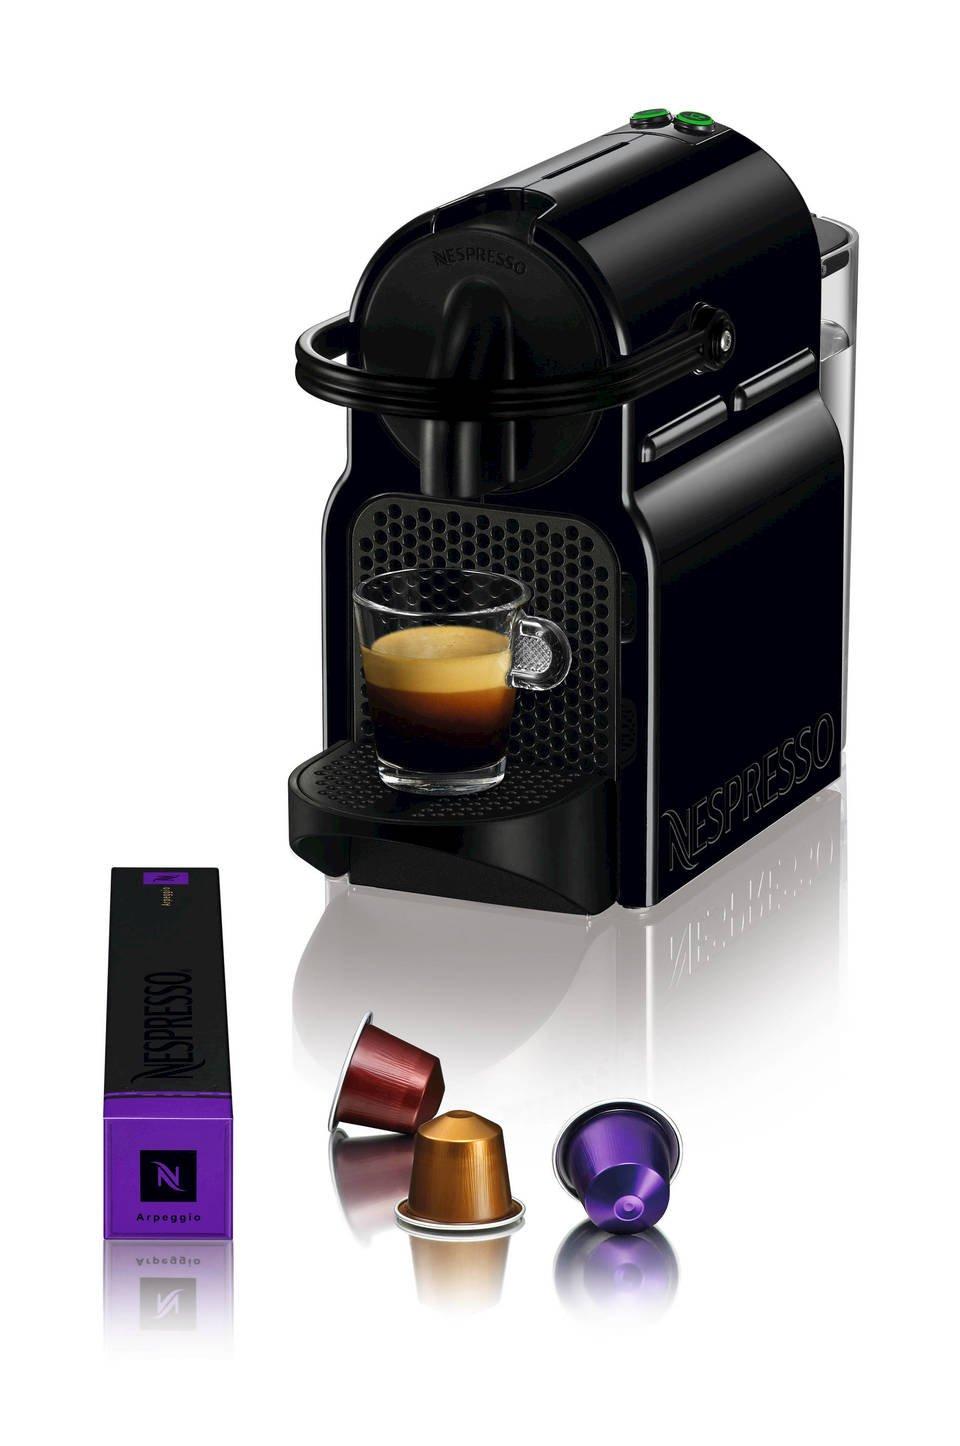 Nespresso Inissia Espresso Maker with Aeroccino Plus Milk Frother, Black (Discontinued Model) by Nespresso (Image #2)